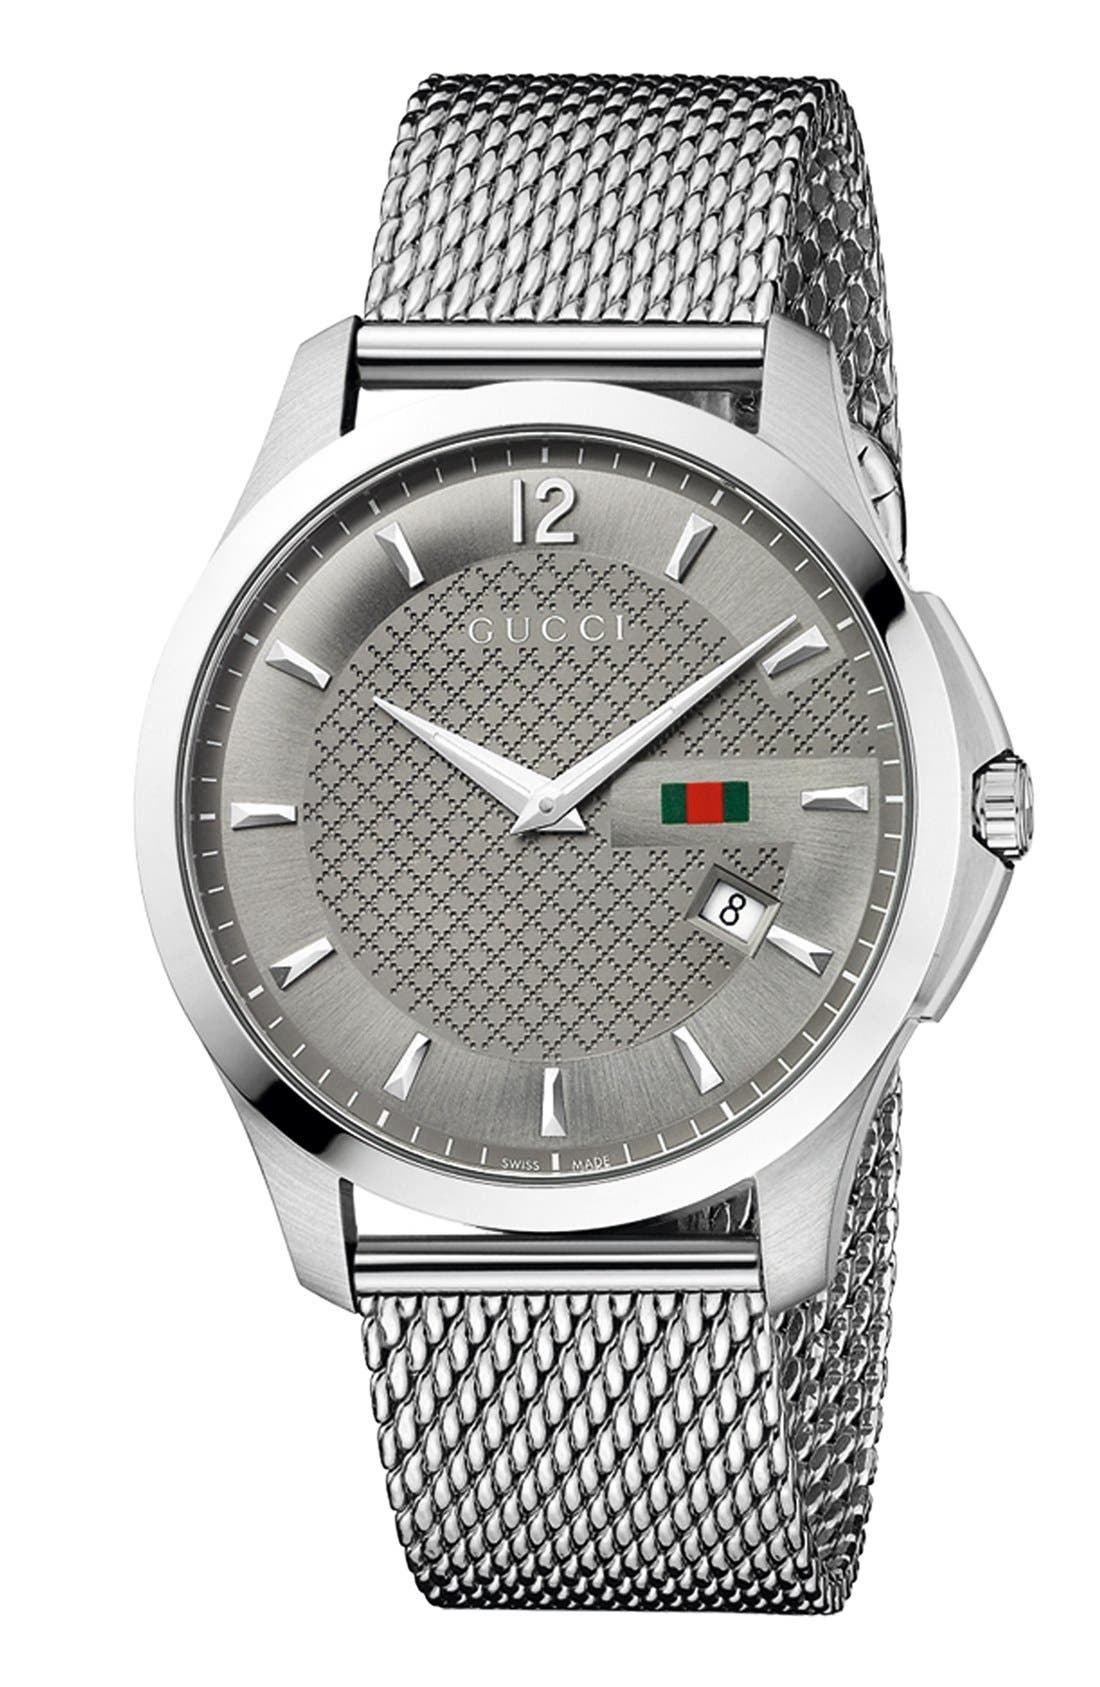 Main Image - Gucci 'G-Timeless' Mesh Bracelet Watch, 40mm